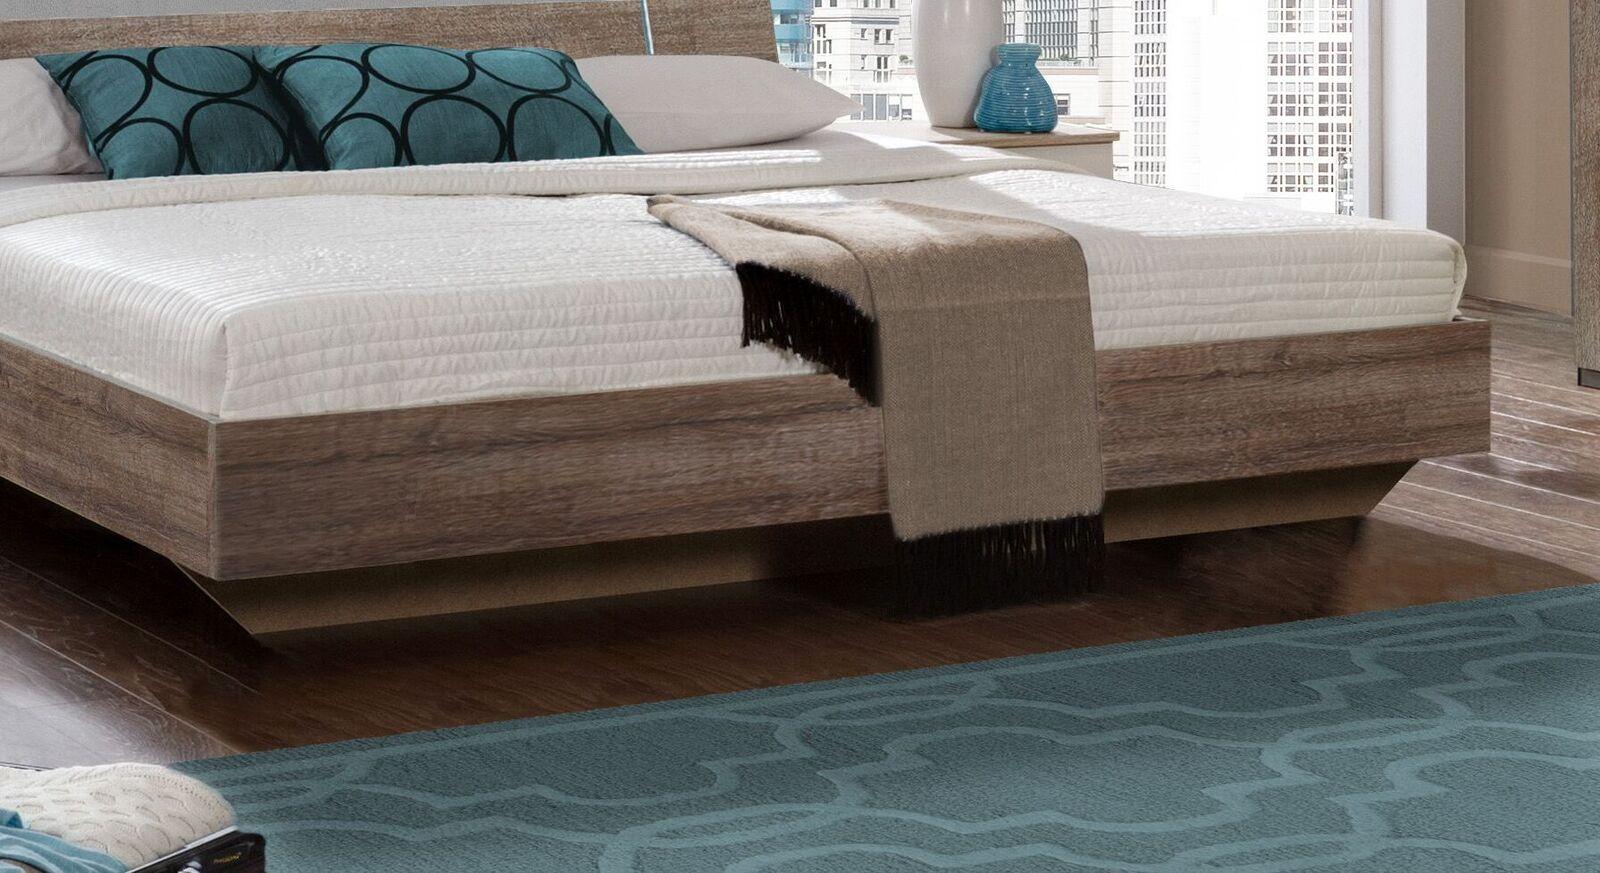 Bett Ovatio mit geradlinigem Design